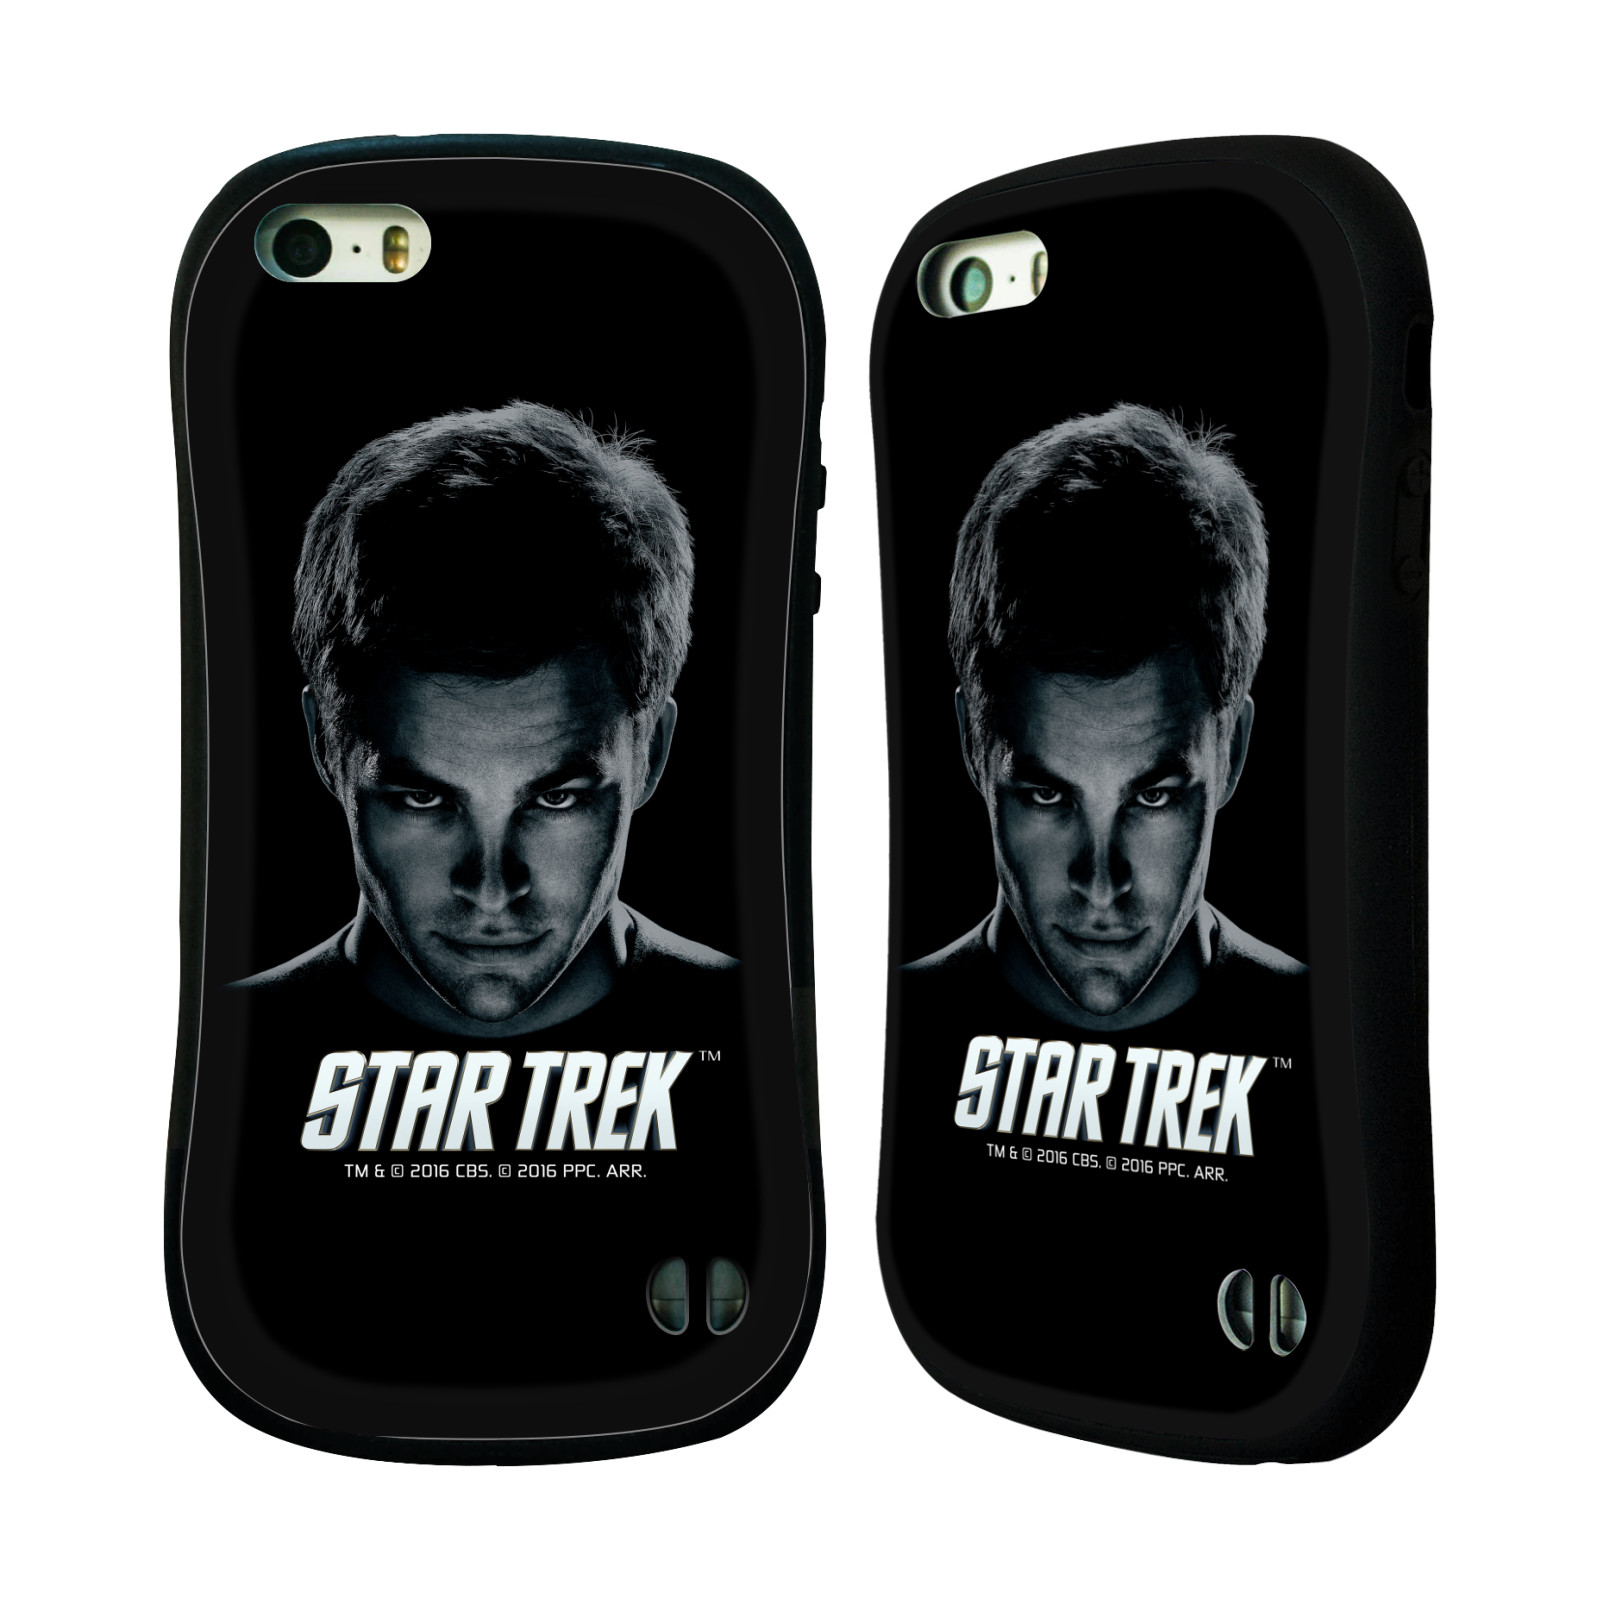 HEAD CASE silikon/plast odolný obal na mobil Apple Iphone 5 / 5S Star Trek Filmové postavy kapitán Kirk